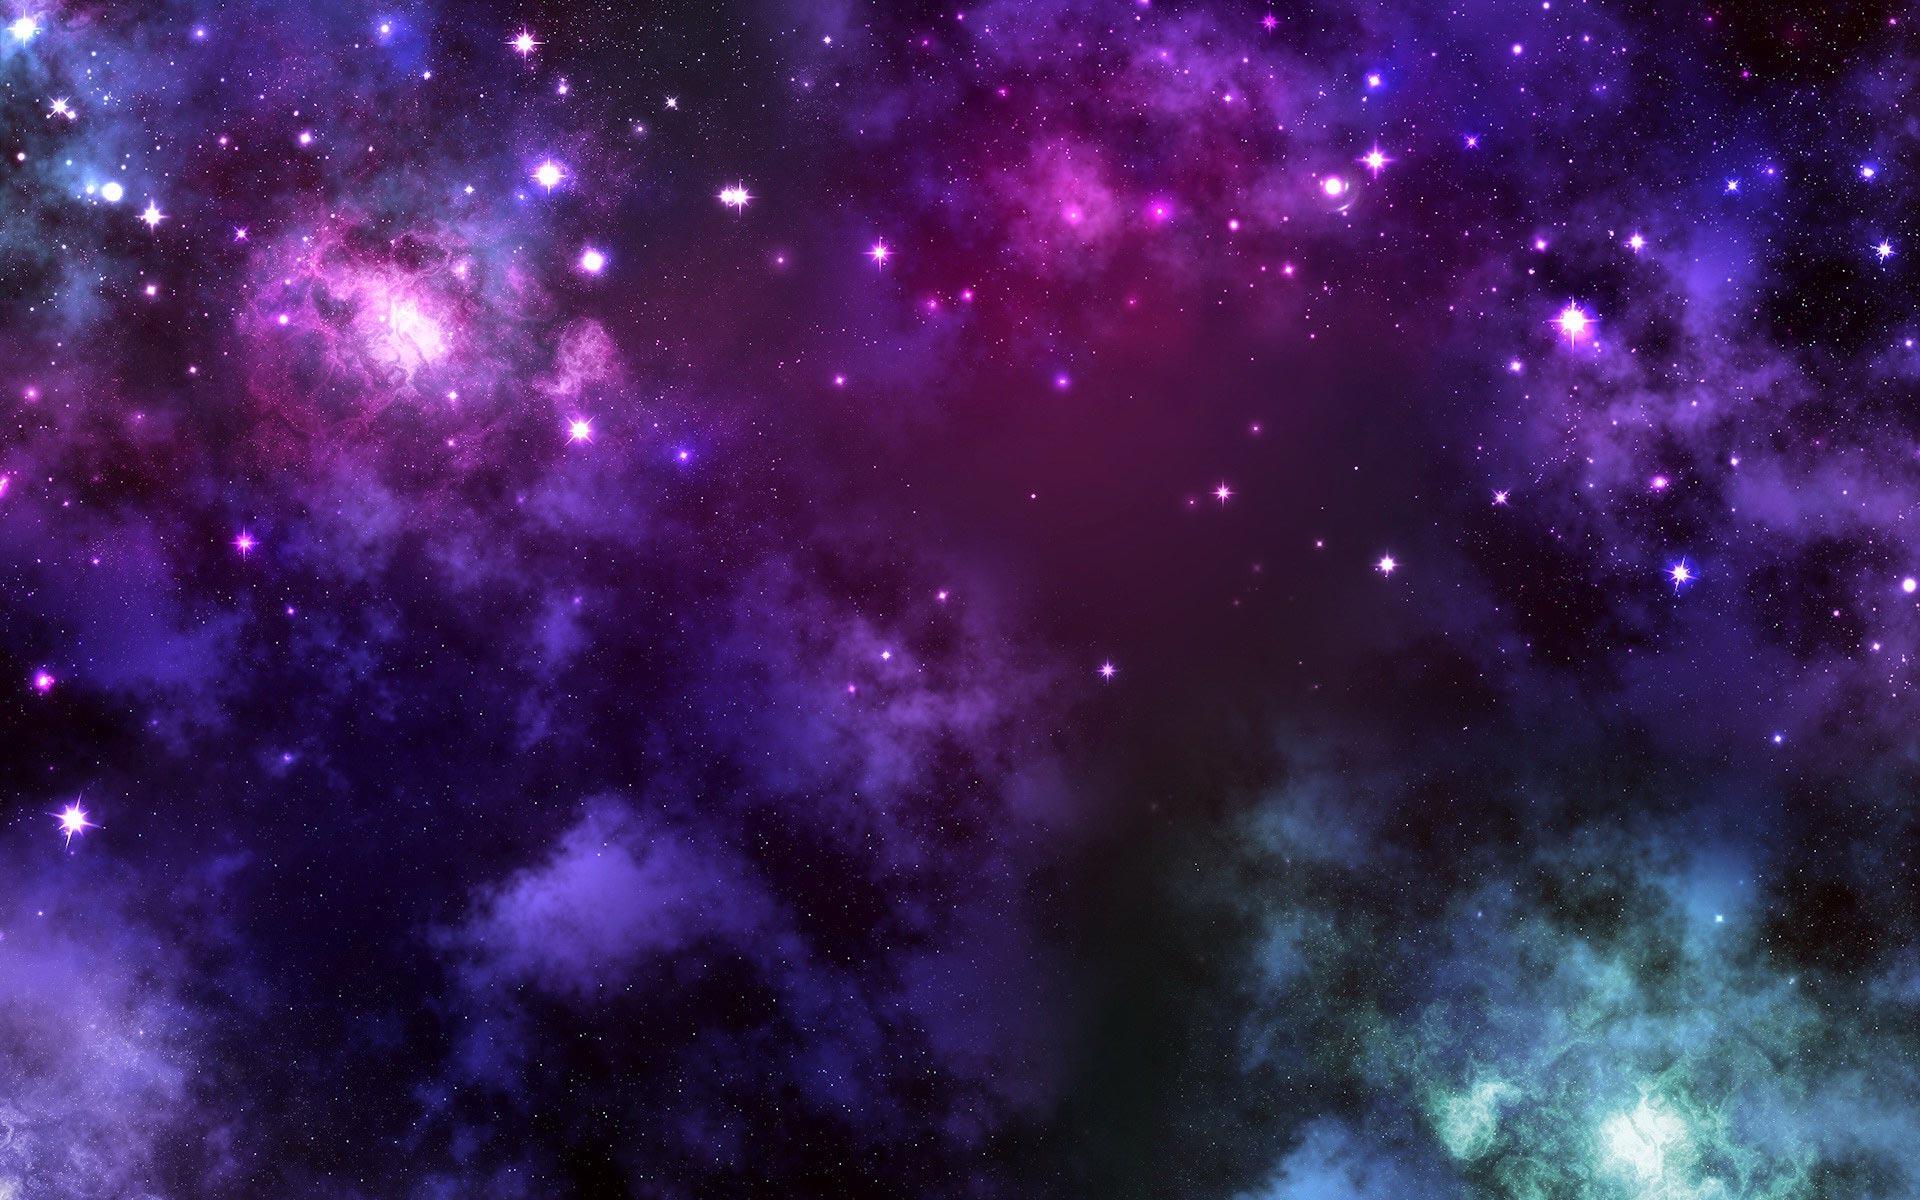 Wallpaper For Samsung Galaxy S5: Pink Galaxy Wallpaper